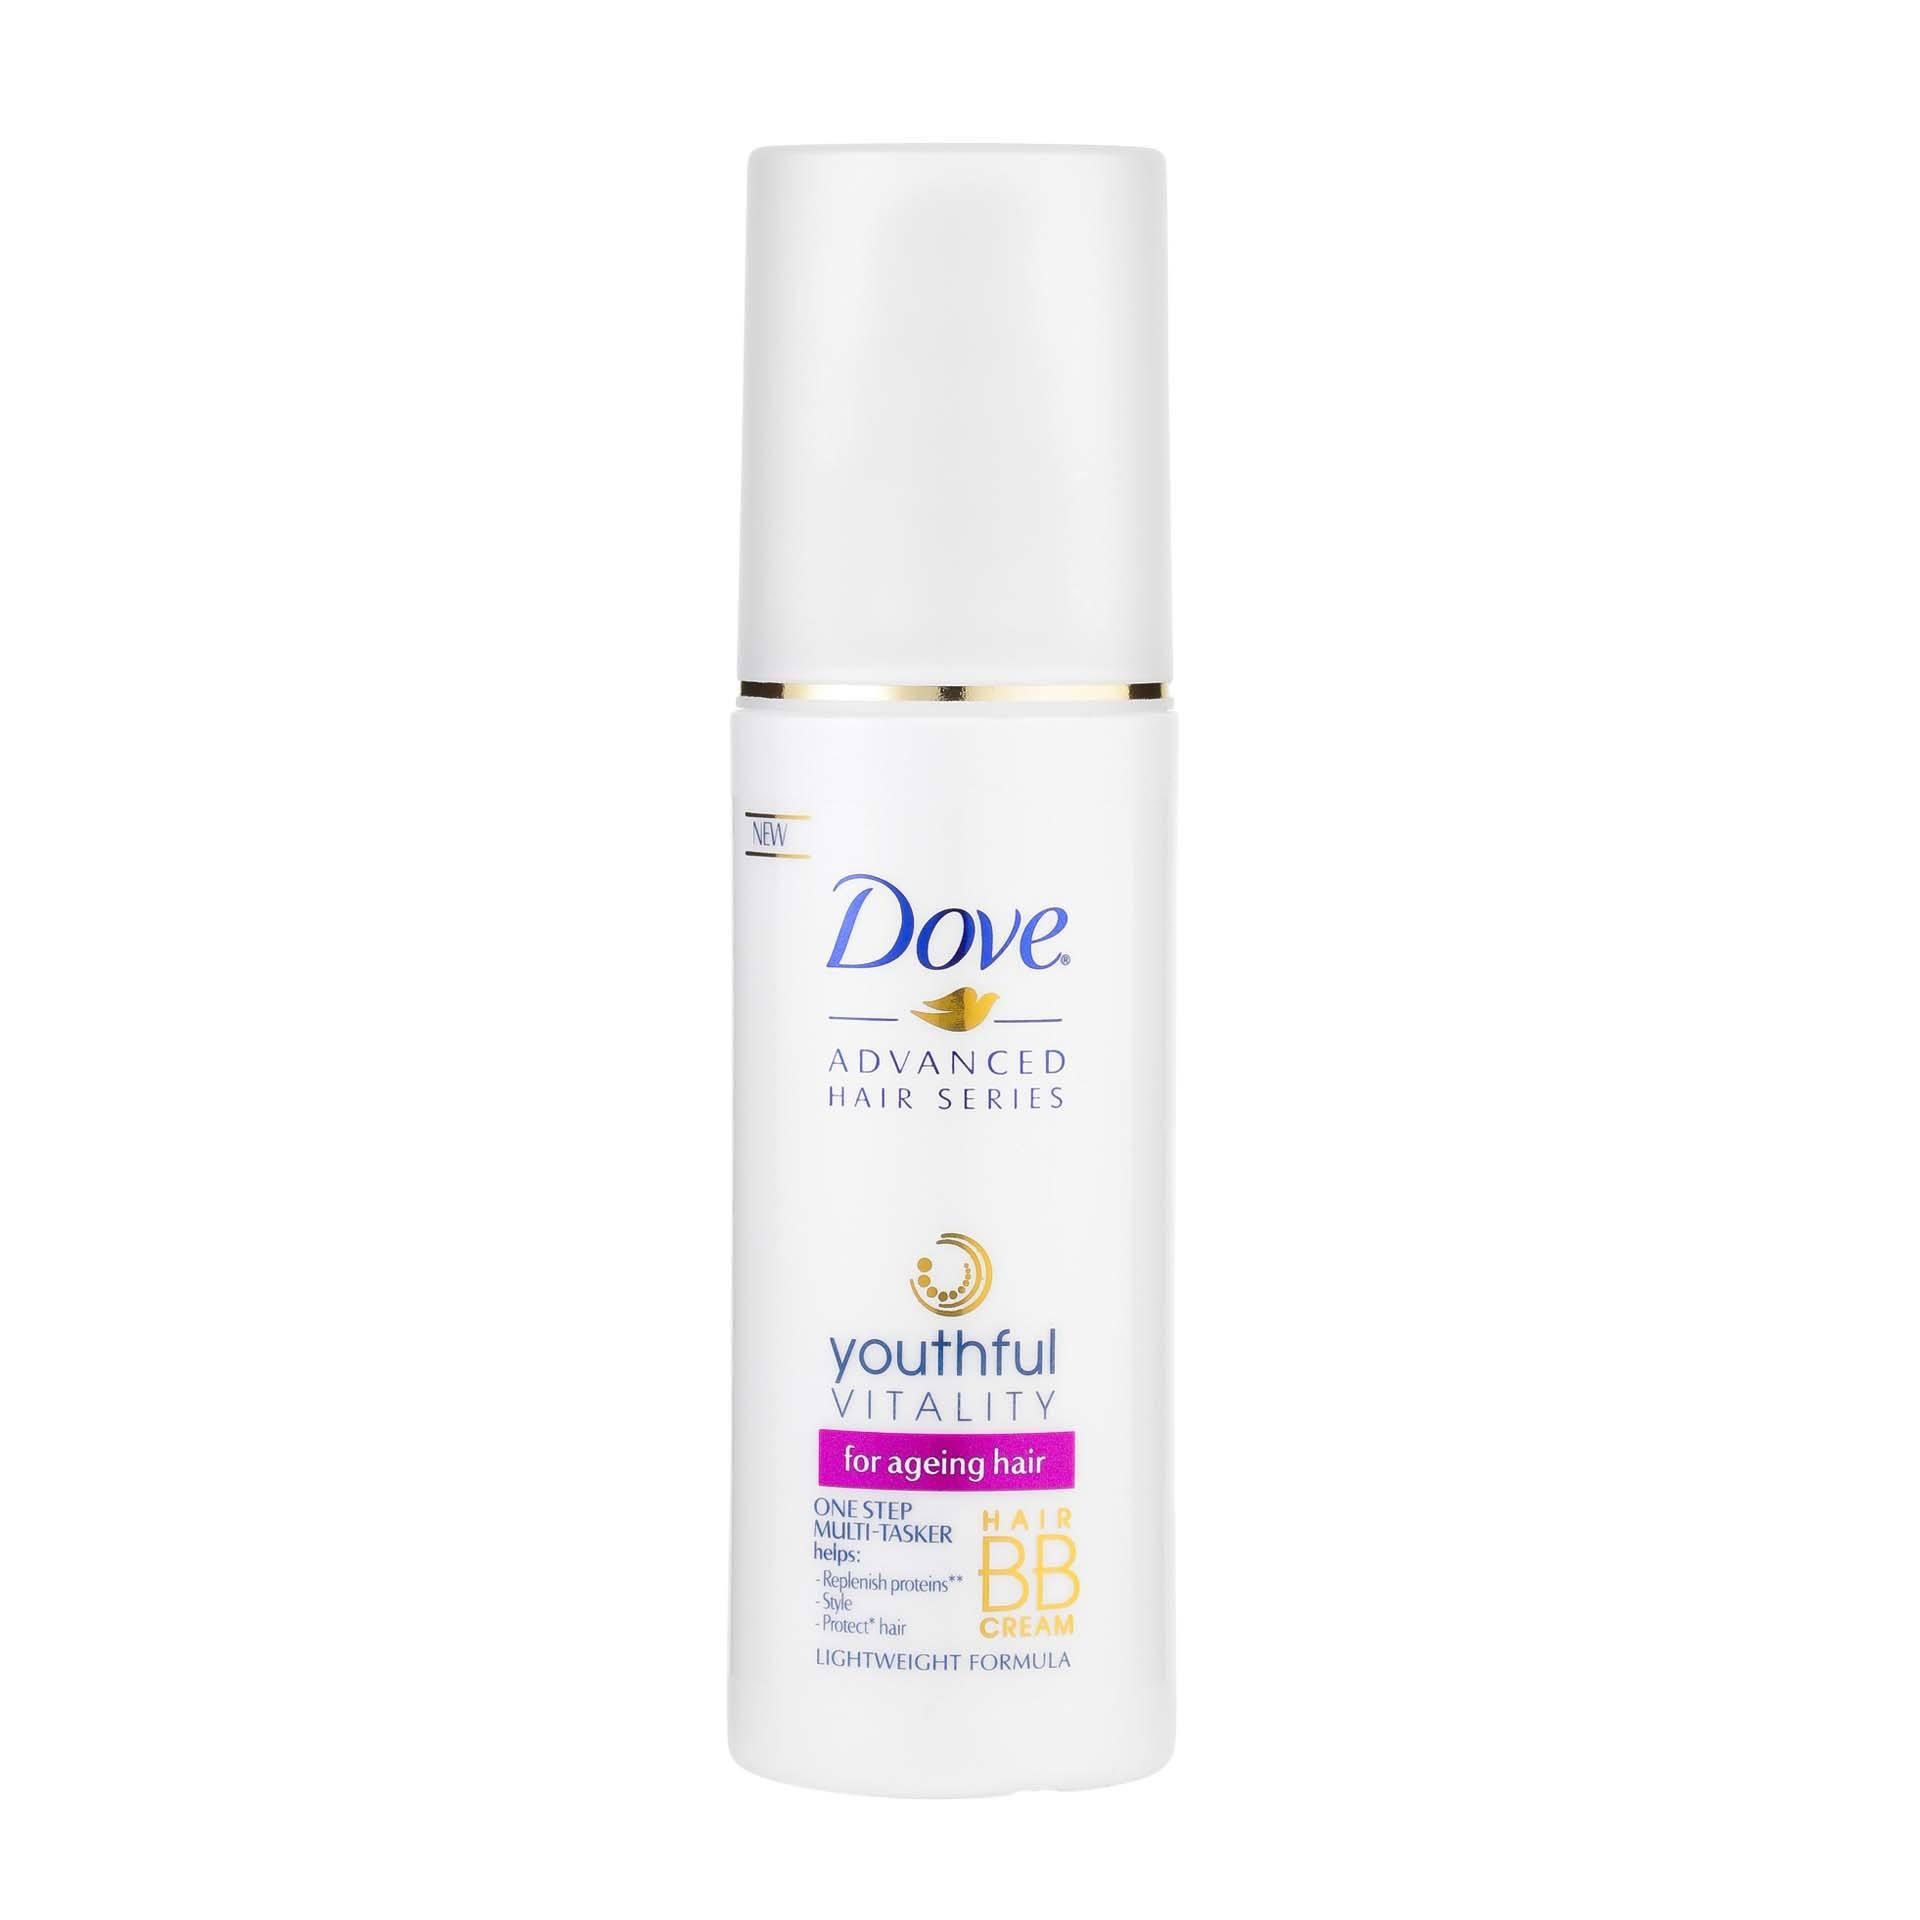 Dove Advanced Hair Series Youthful Vitality BB Cream